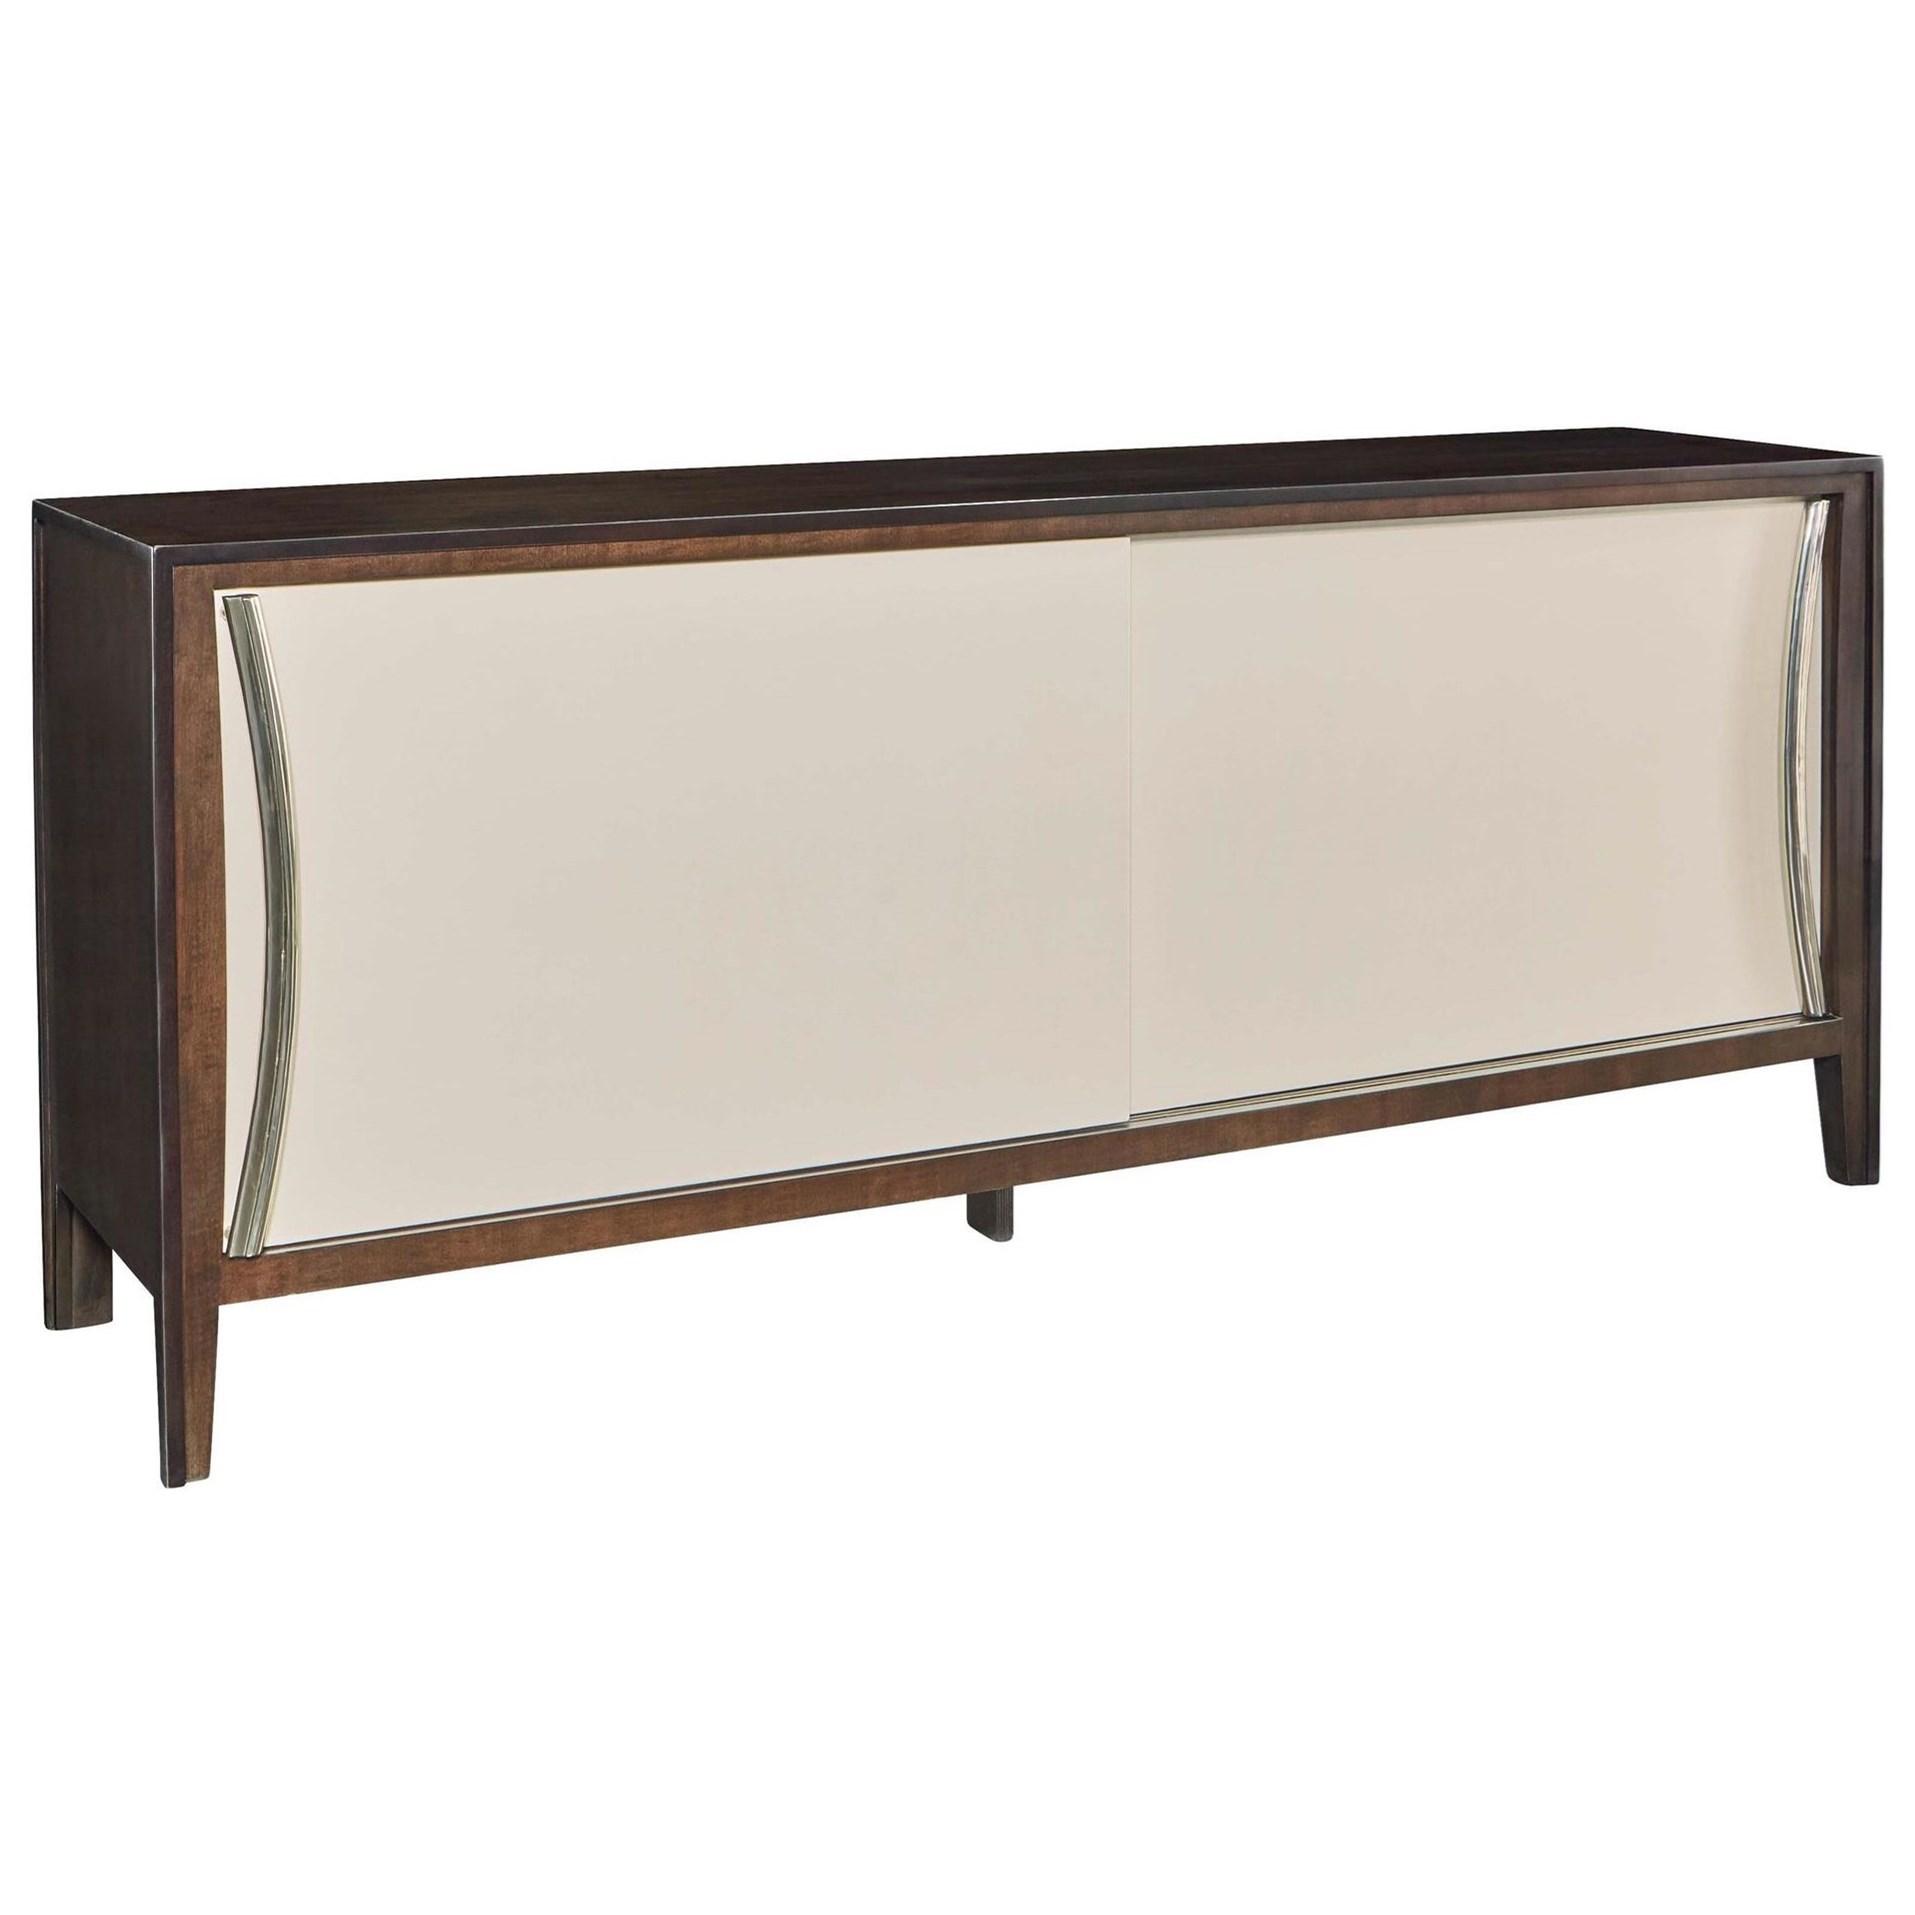 Fine Furniture Design Deco La Credence Credenza - Item Number: 1680-850